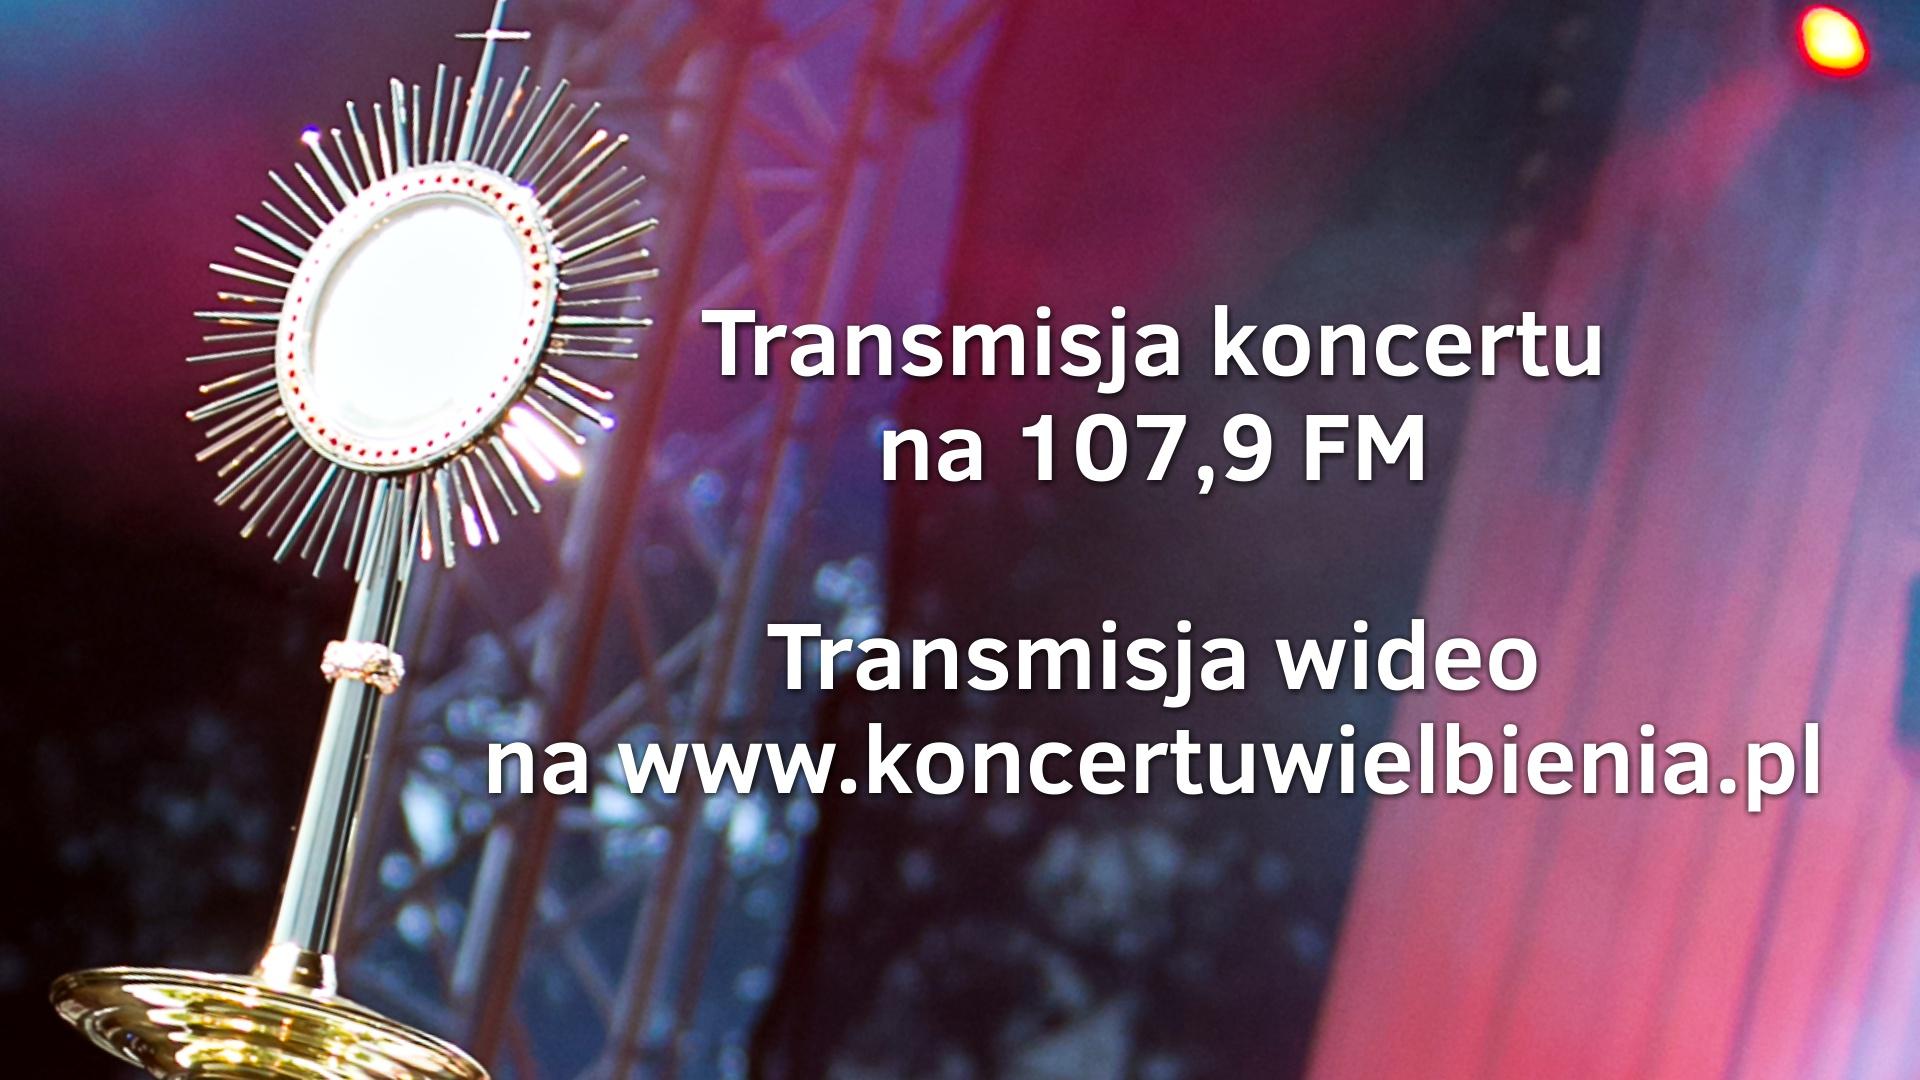 Transmisja-koncertu